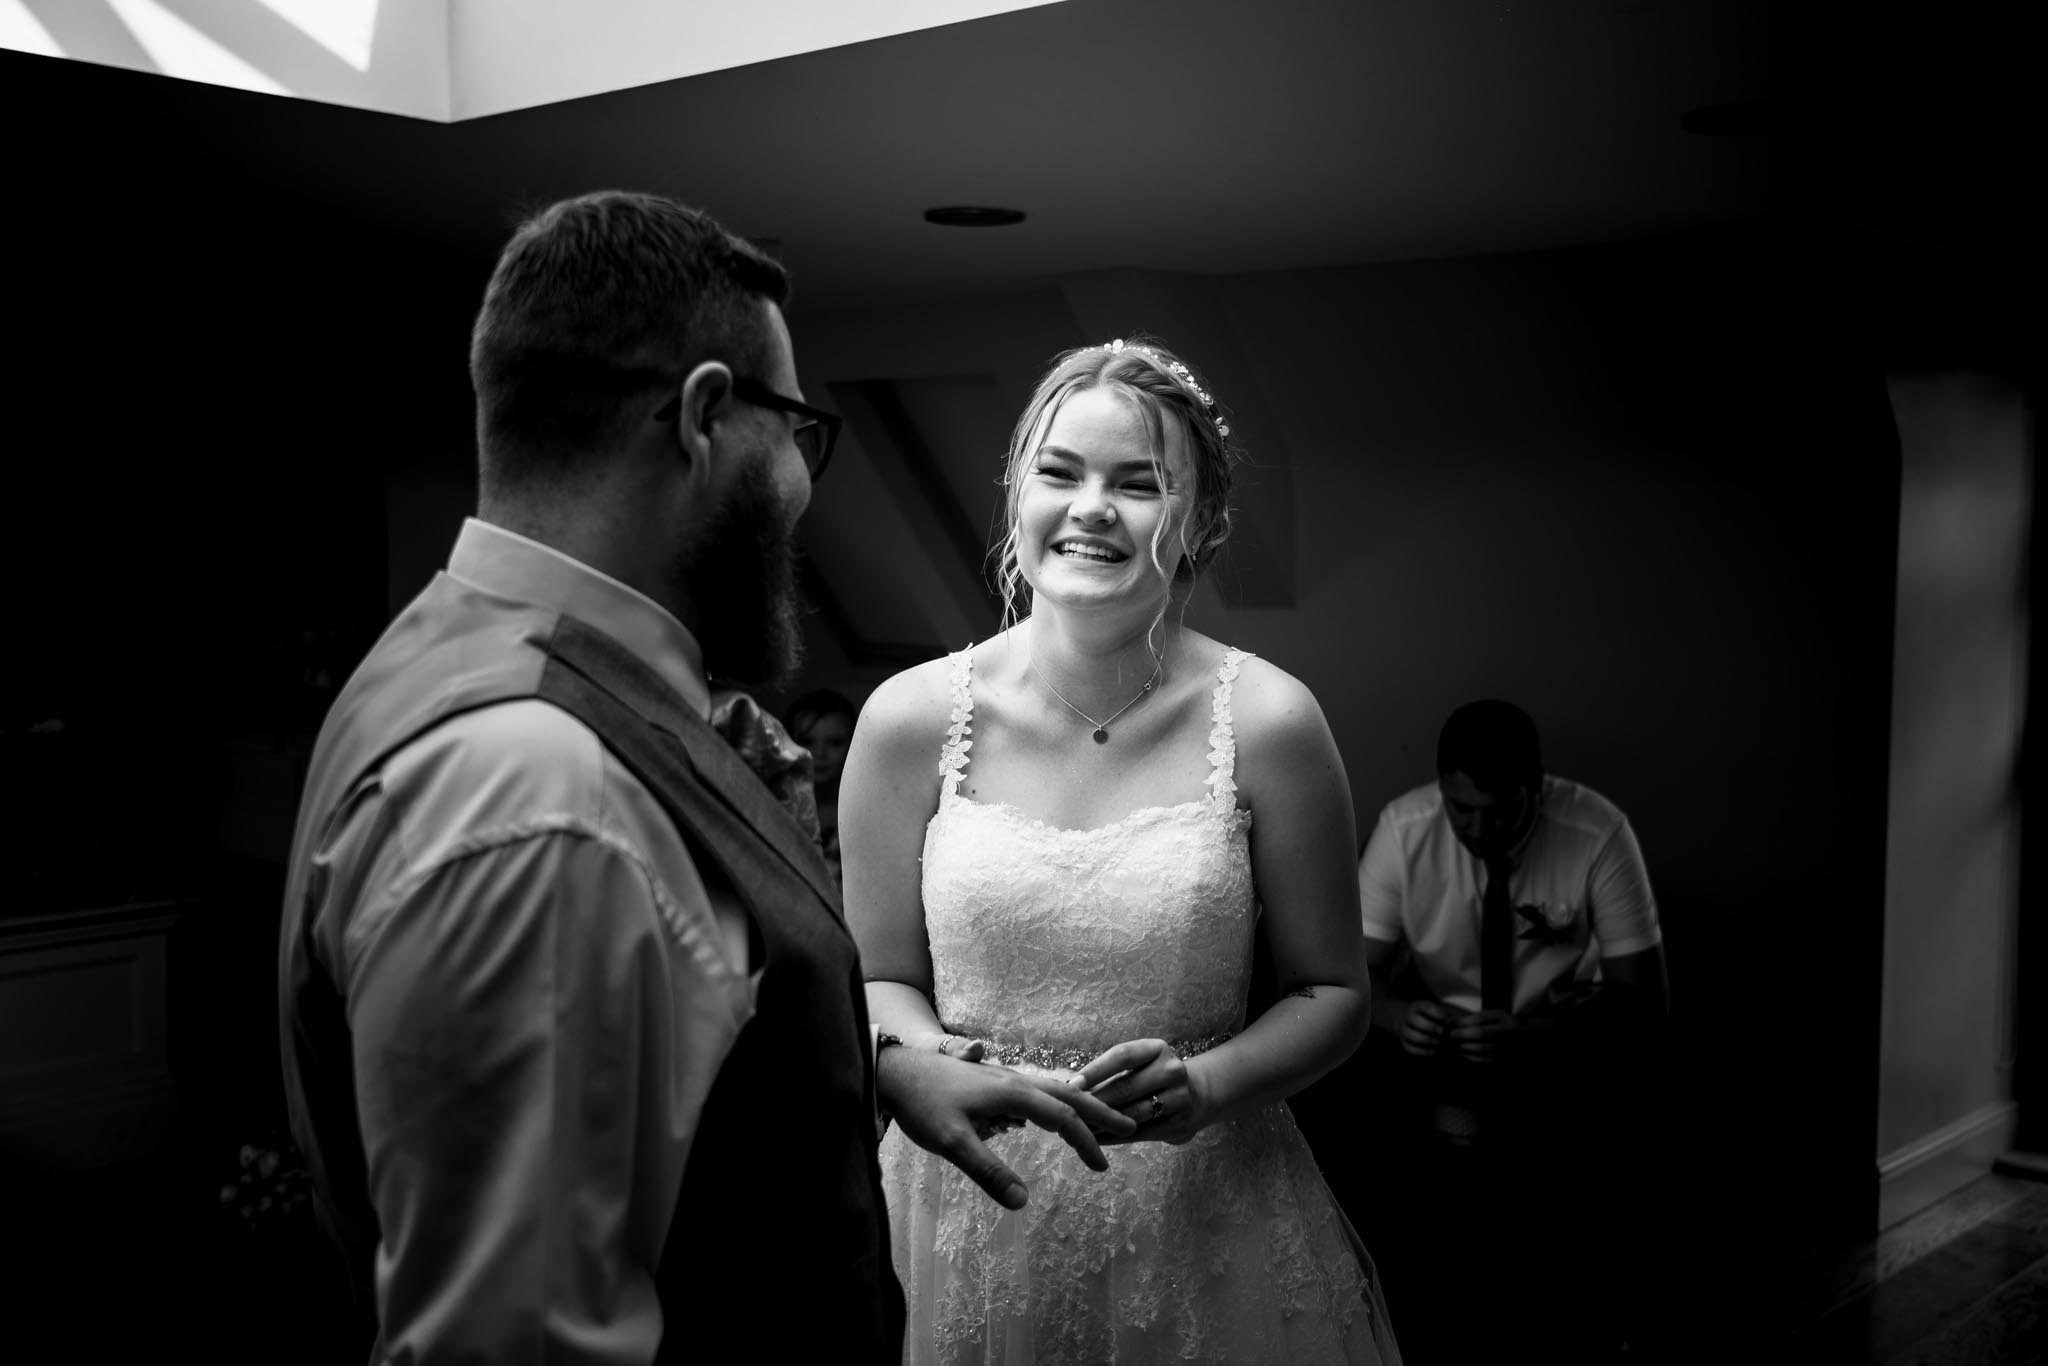 424-Ceremony-Luke-Yasmin-The-Rayleigh-Club-Wedding-Photography.jpg